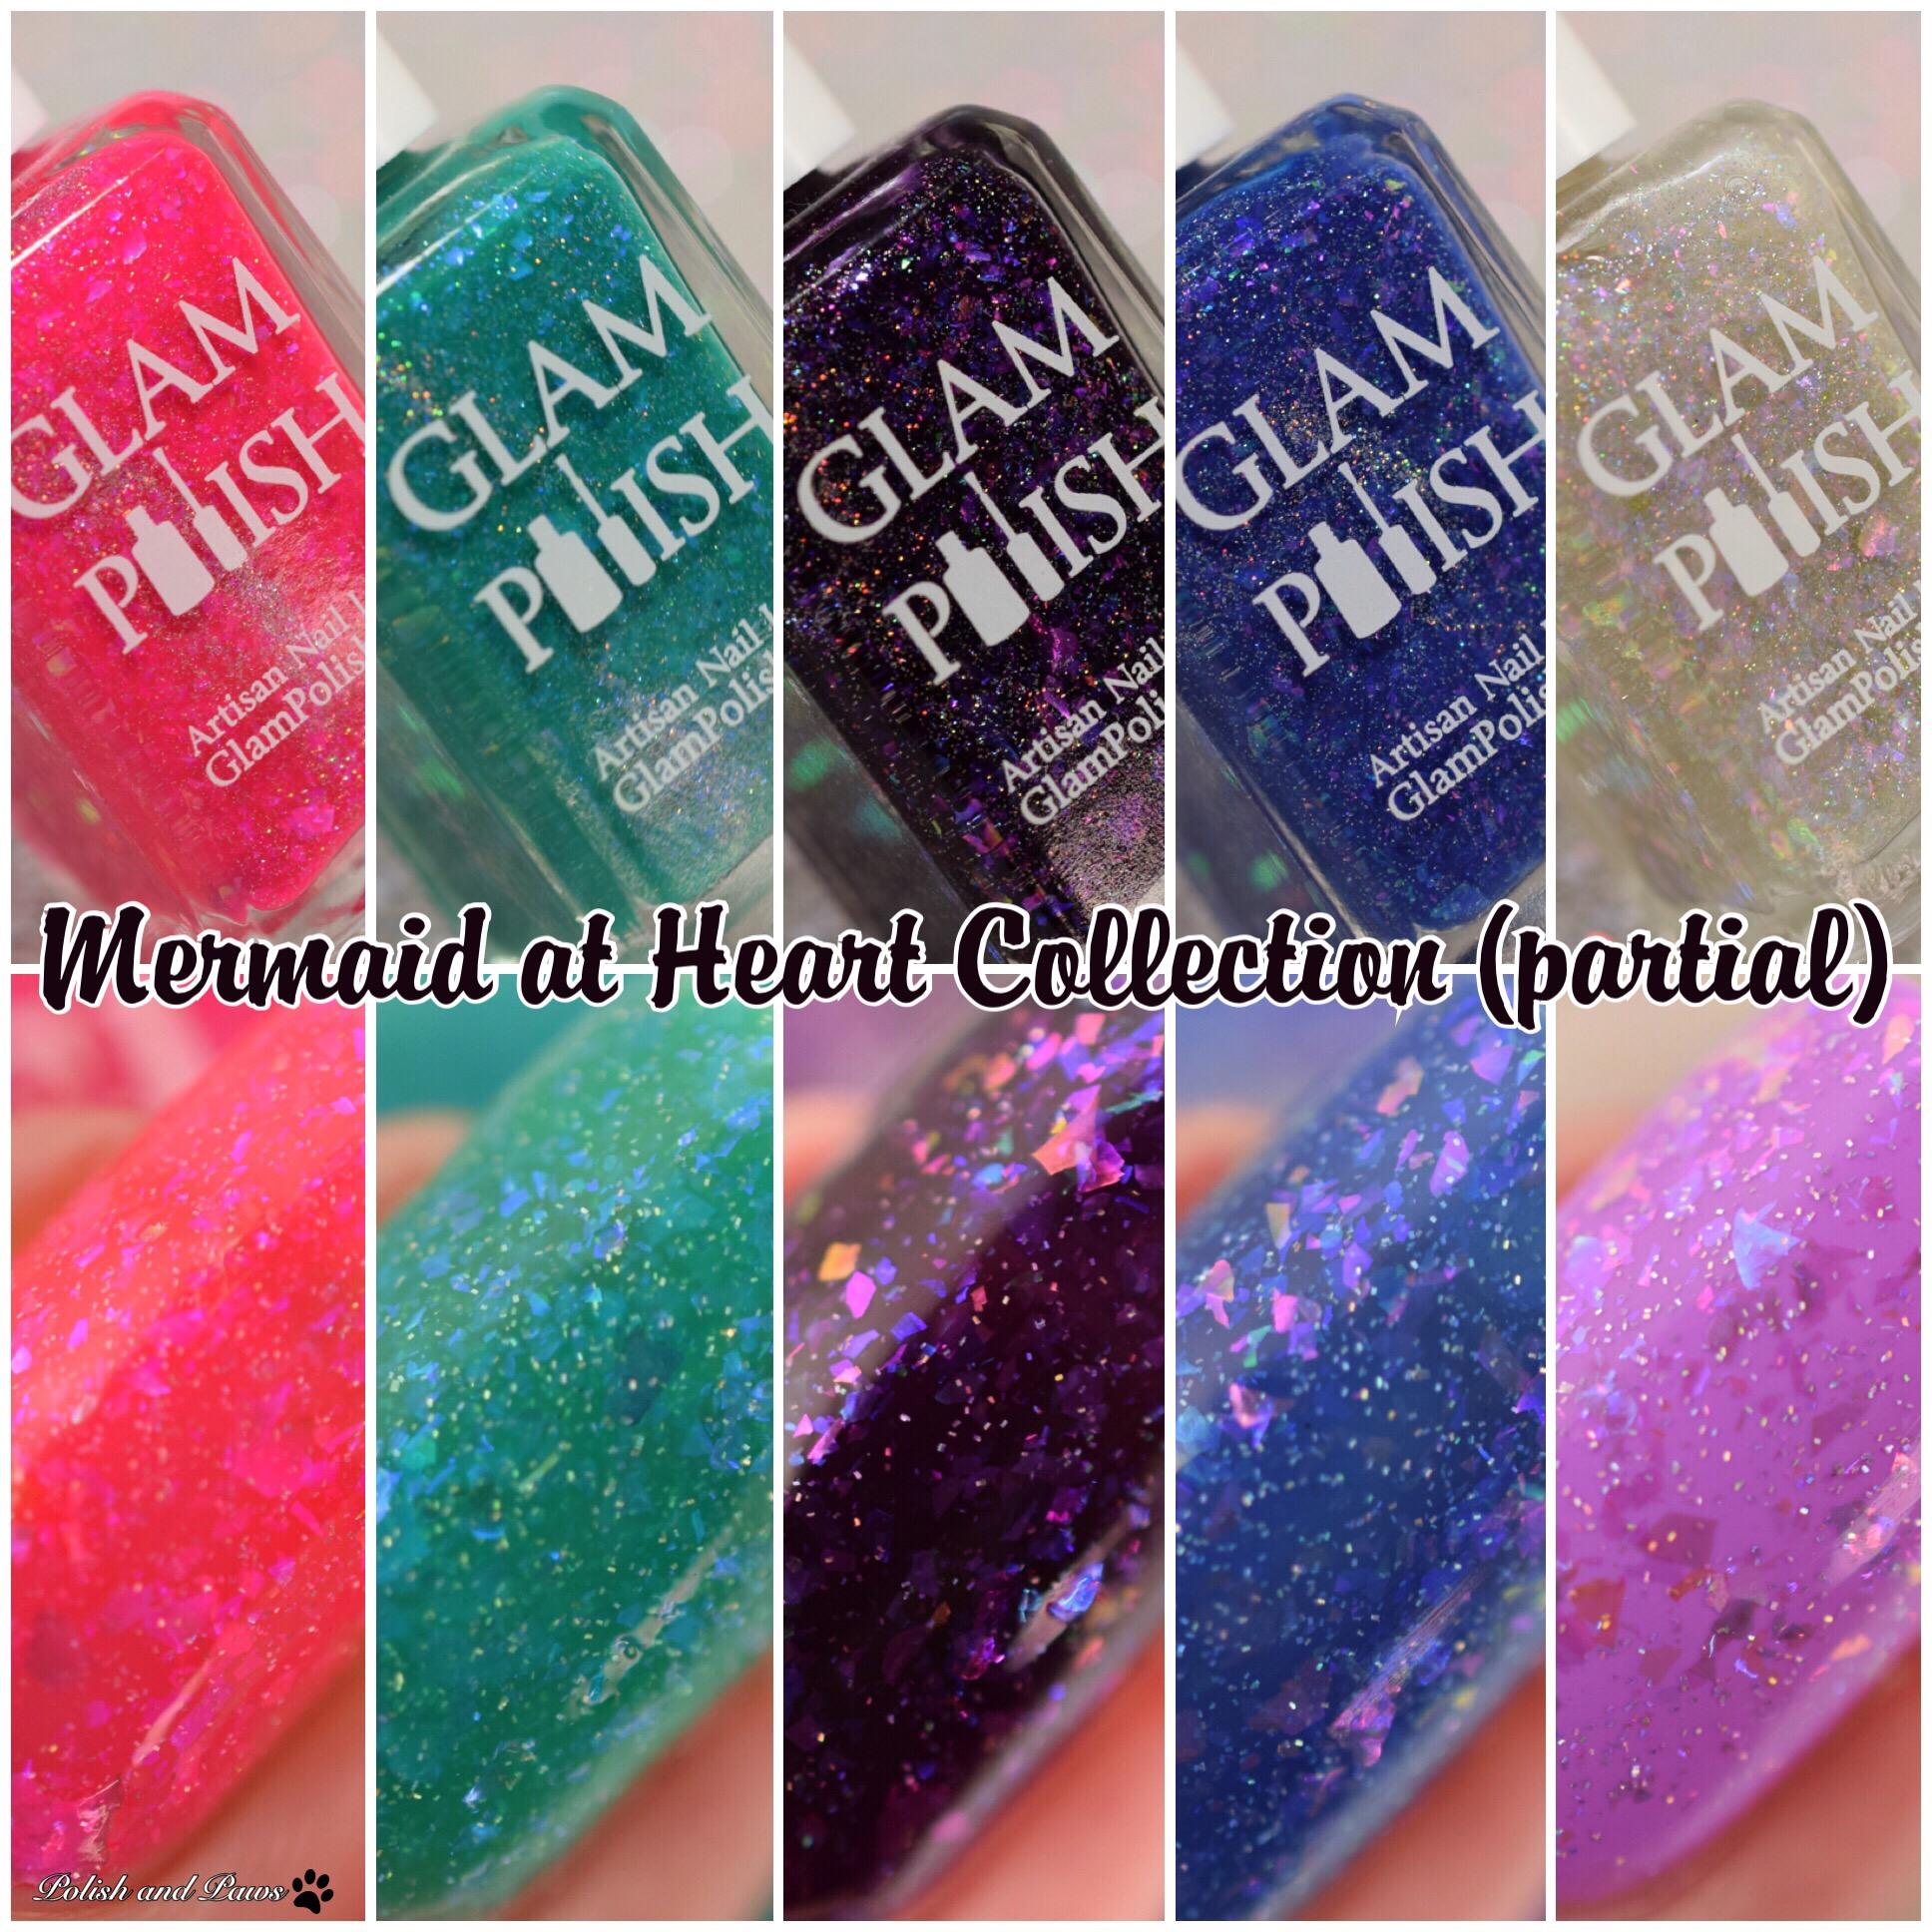 Glam Polish Mermaid at Heart Collection